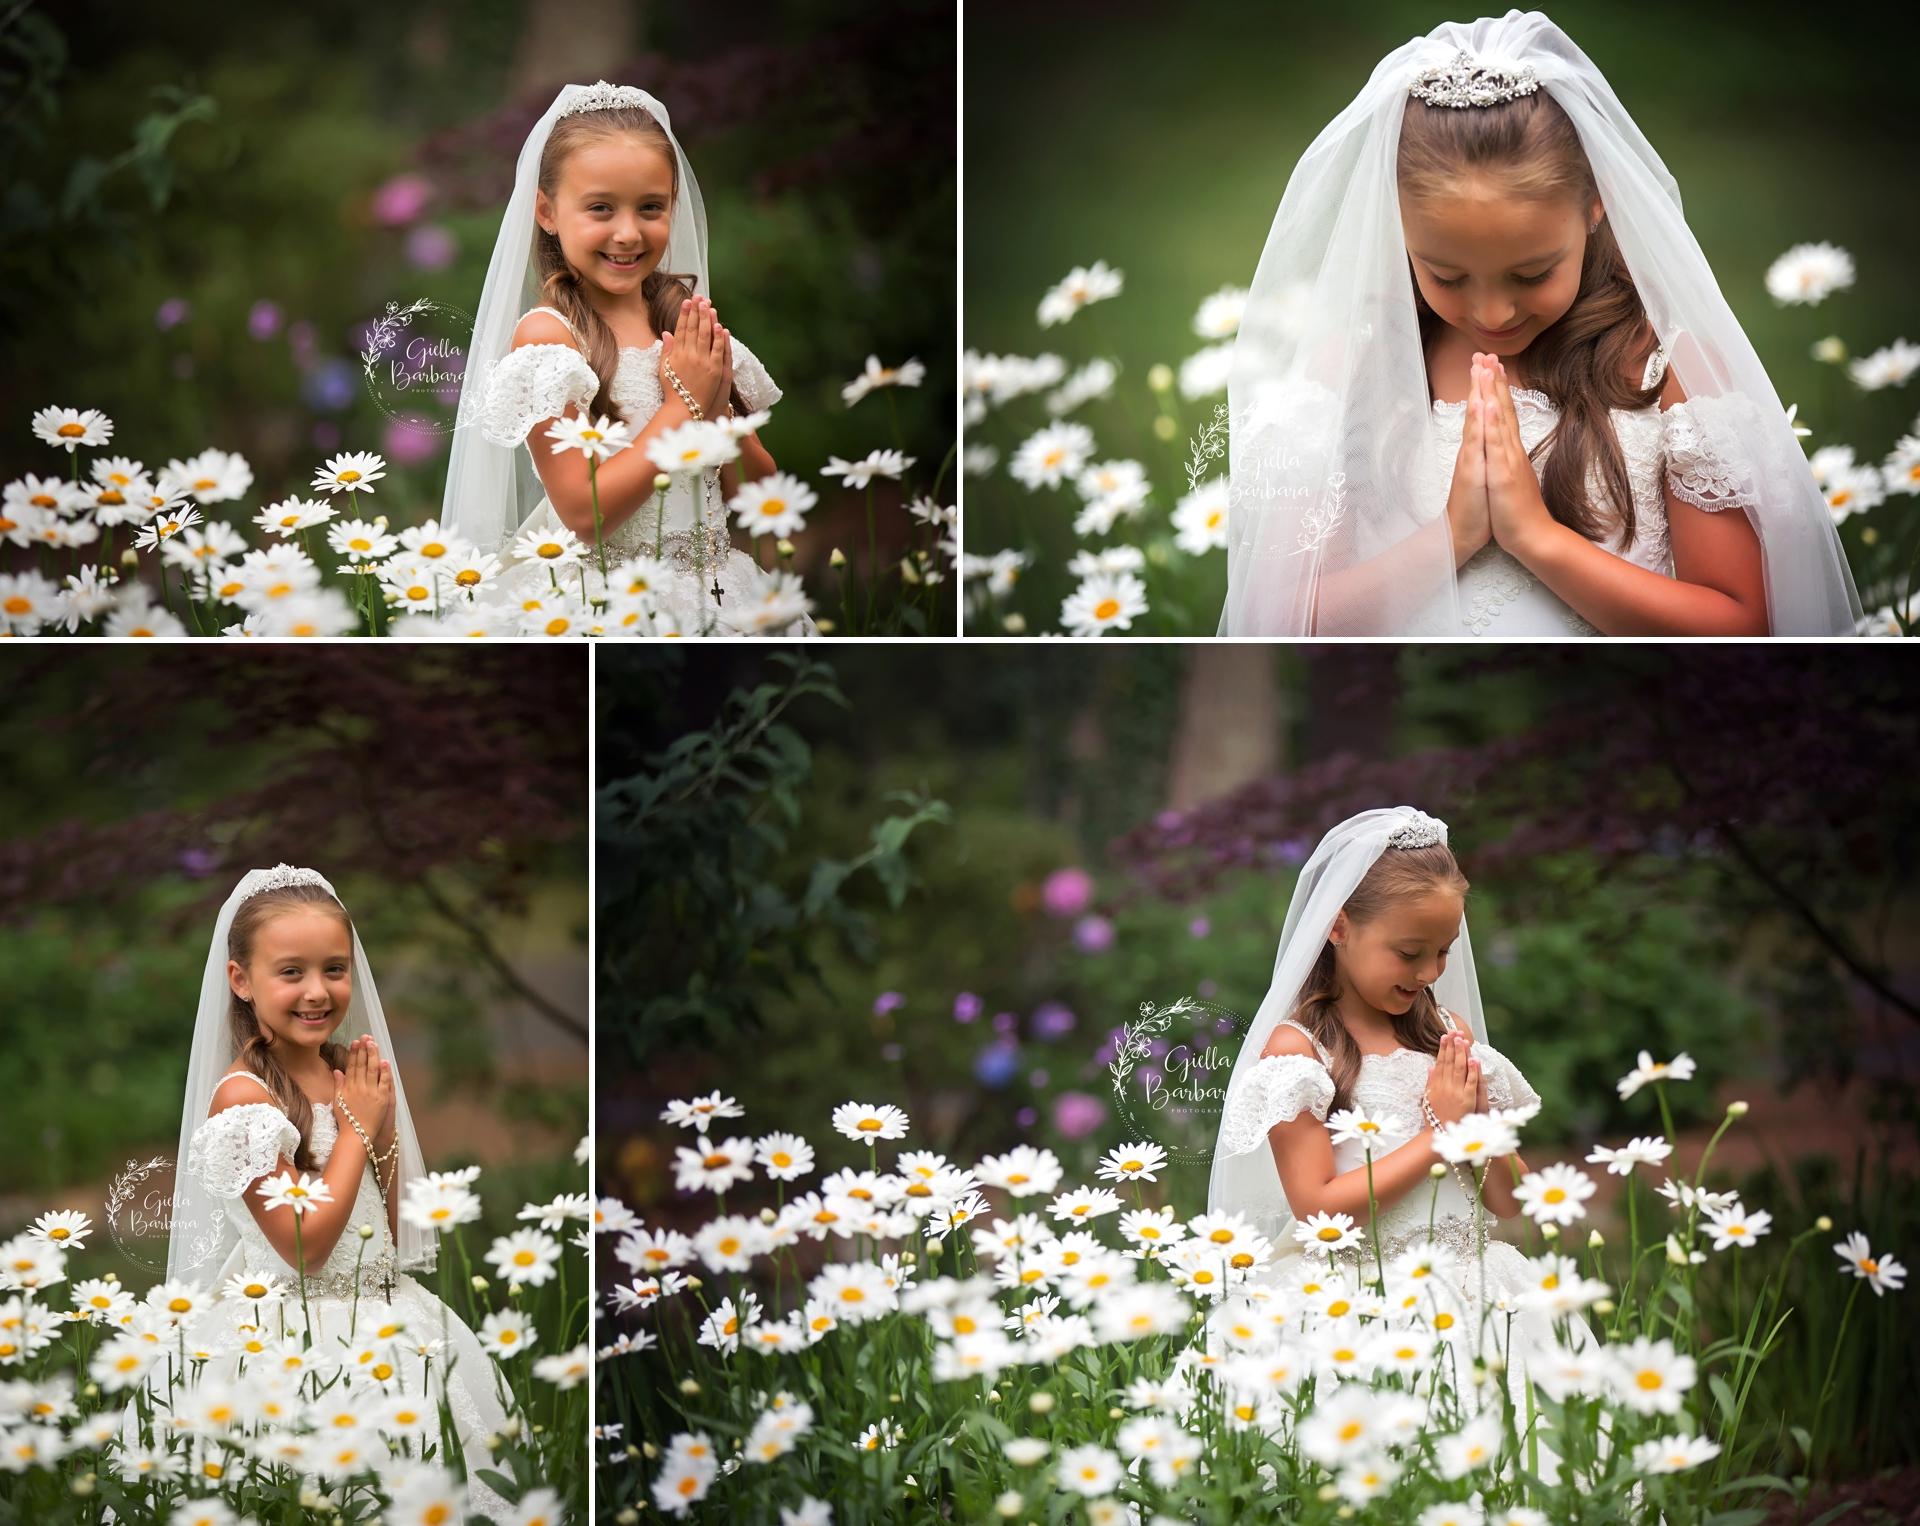 NJ Petite Communion Photography